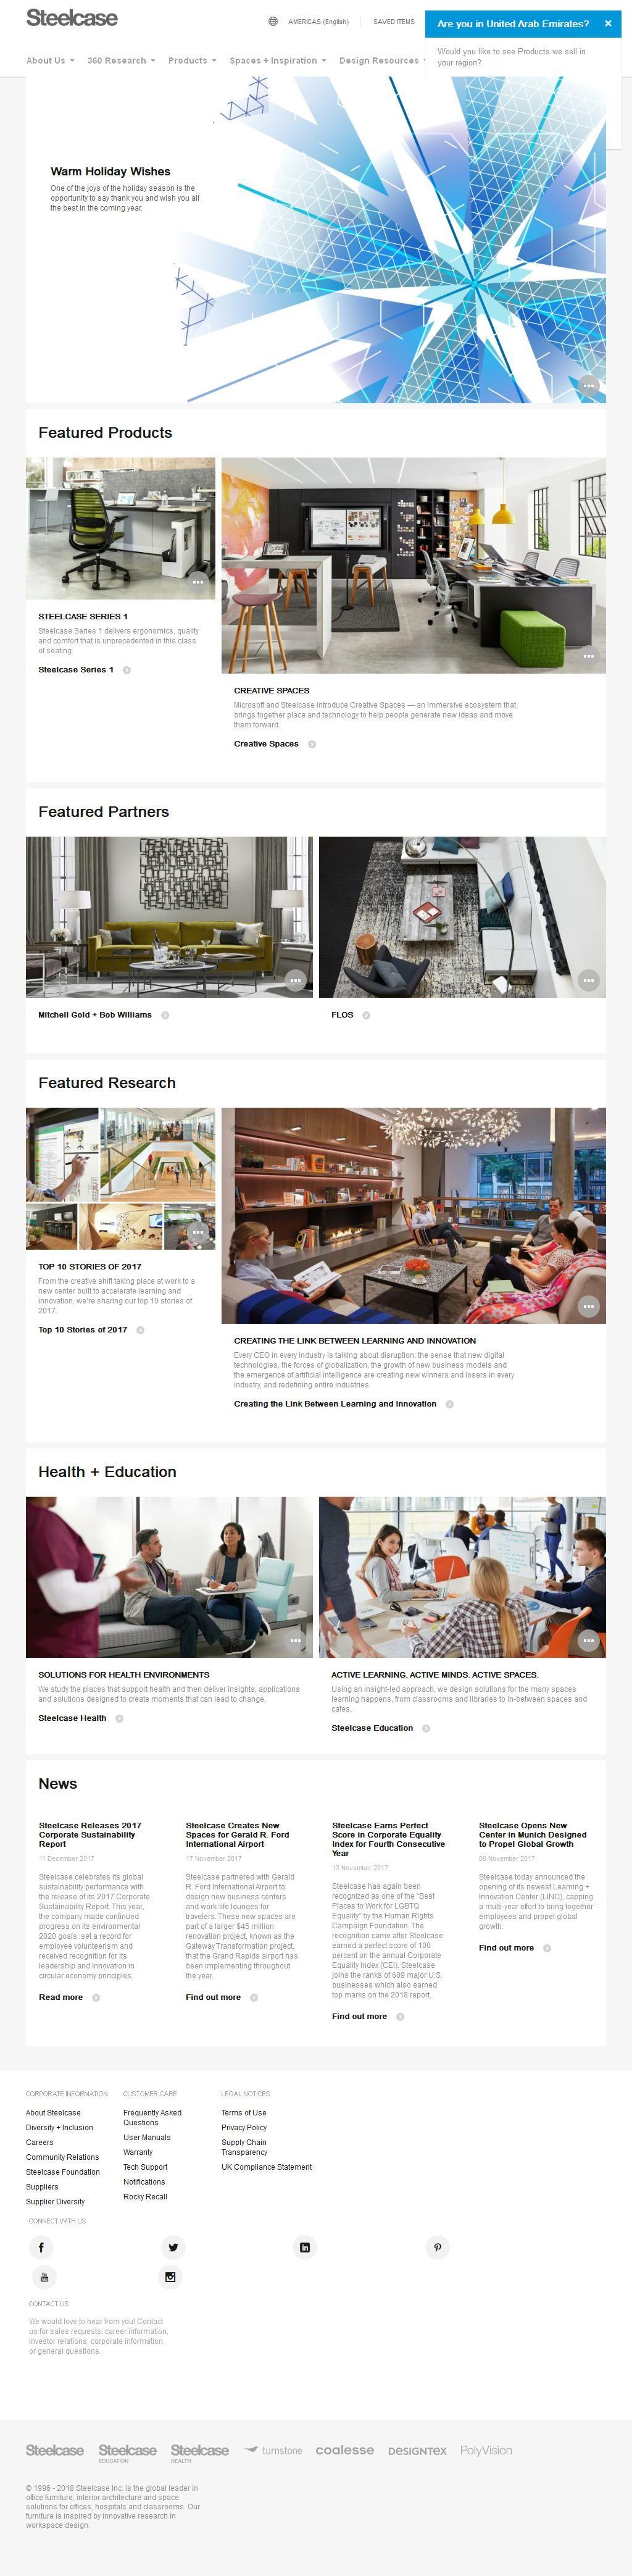 Steelcase Office Furniture Store Design House, 24, Al Soufor Street 1 Floor Al  Sufouh 1   372, Jumeirah, Dubai | Www.HaiUAE.com Is A Complete Travel Guide  ...